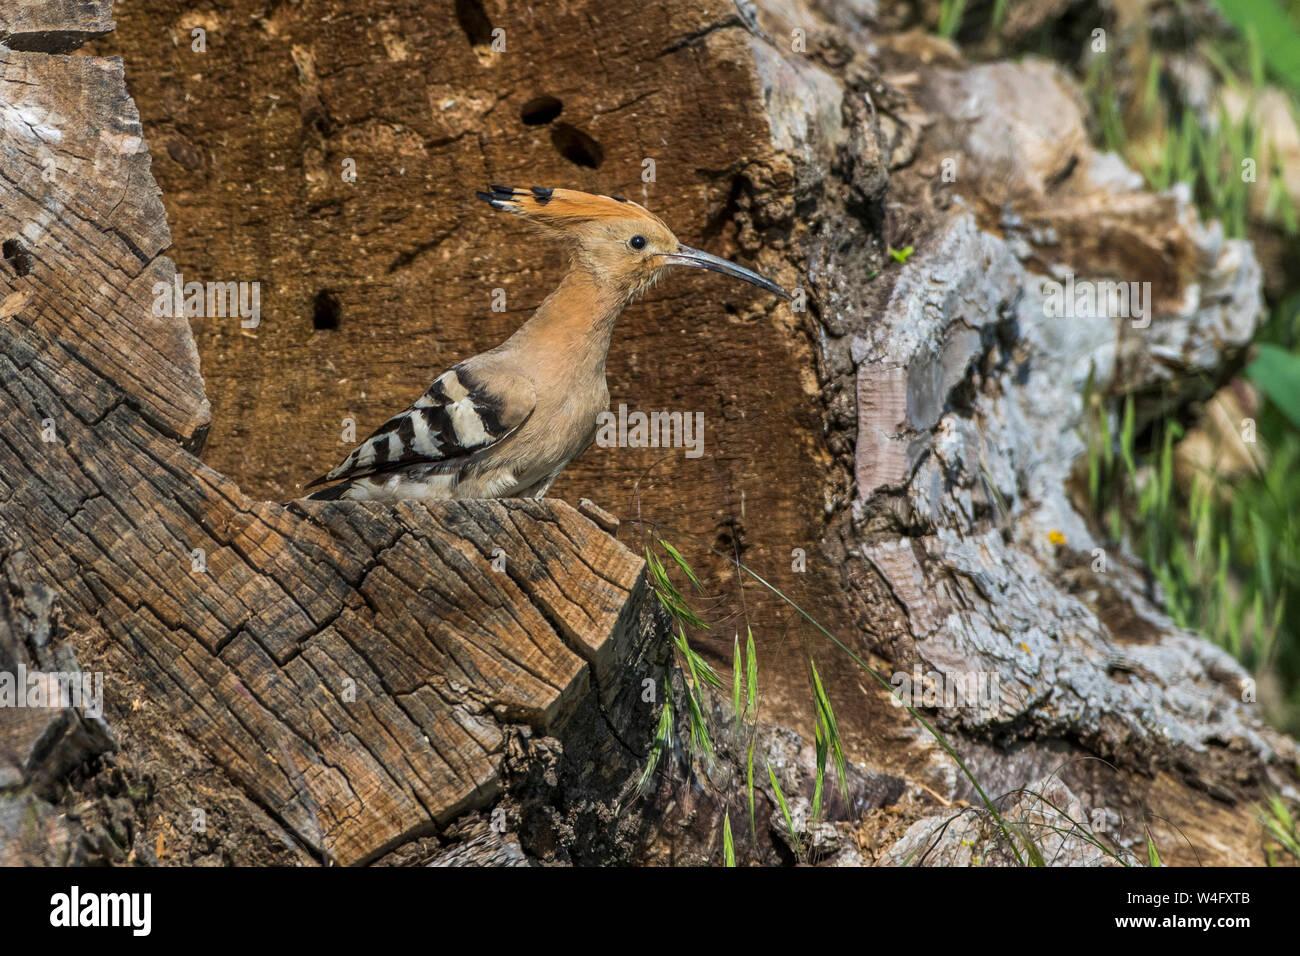 Eurasischen wiedehopf Wiedehopf (Upupa epops) Stockfoto